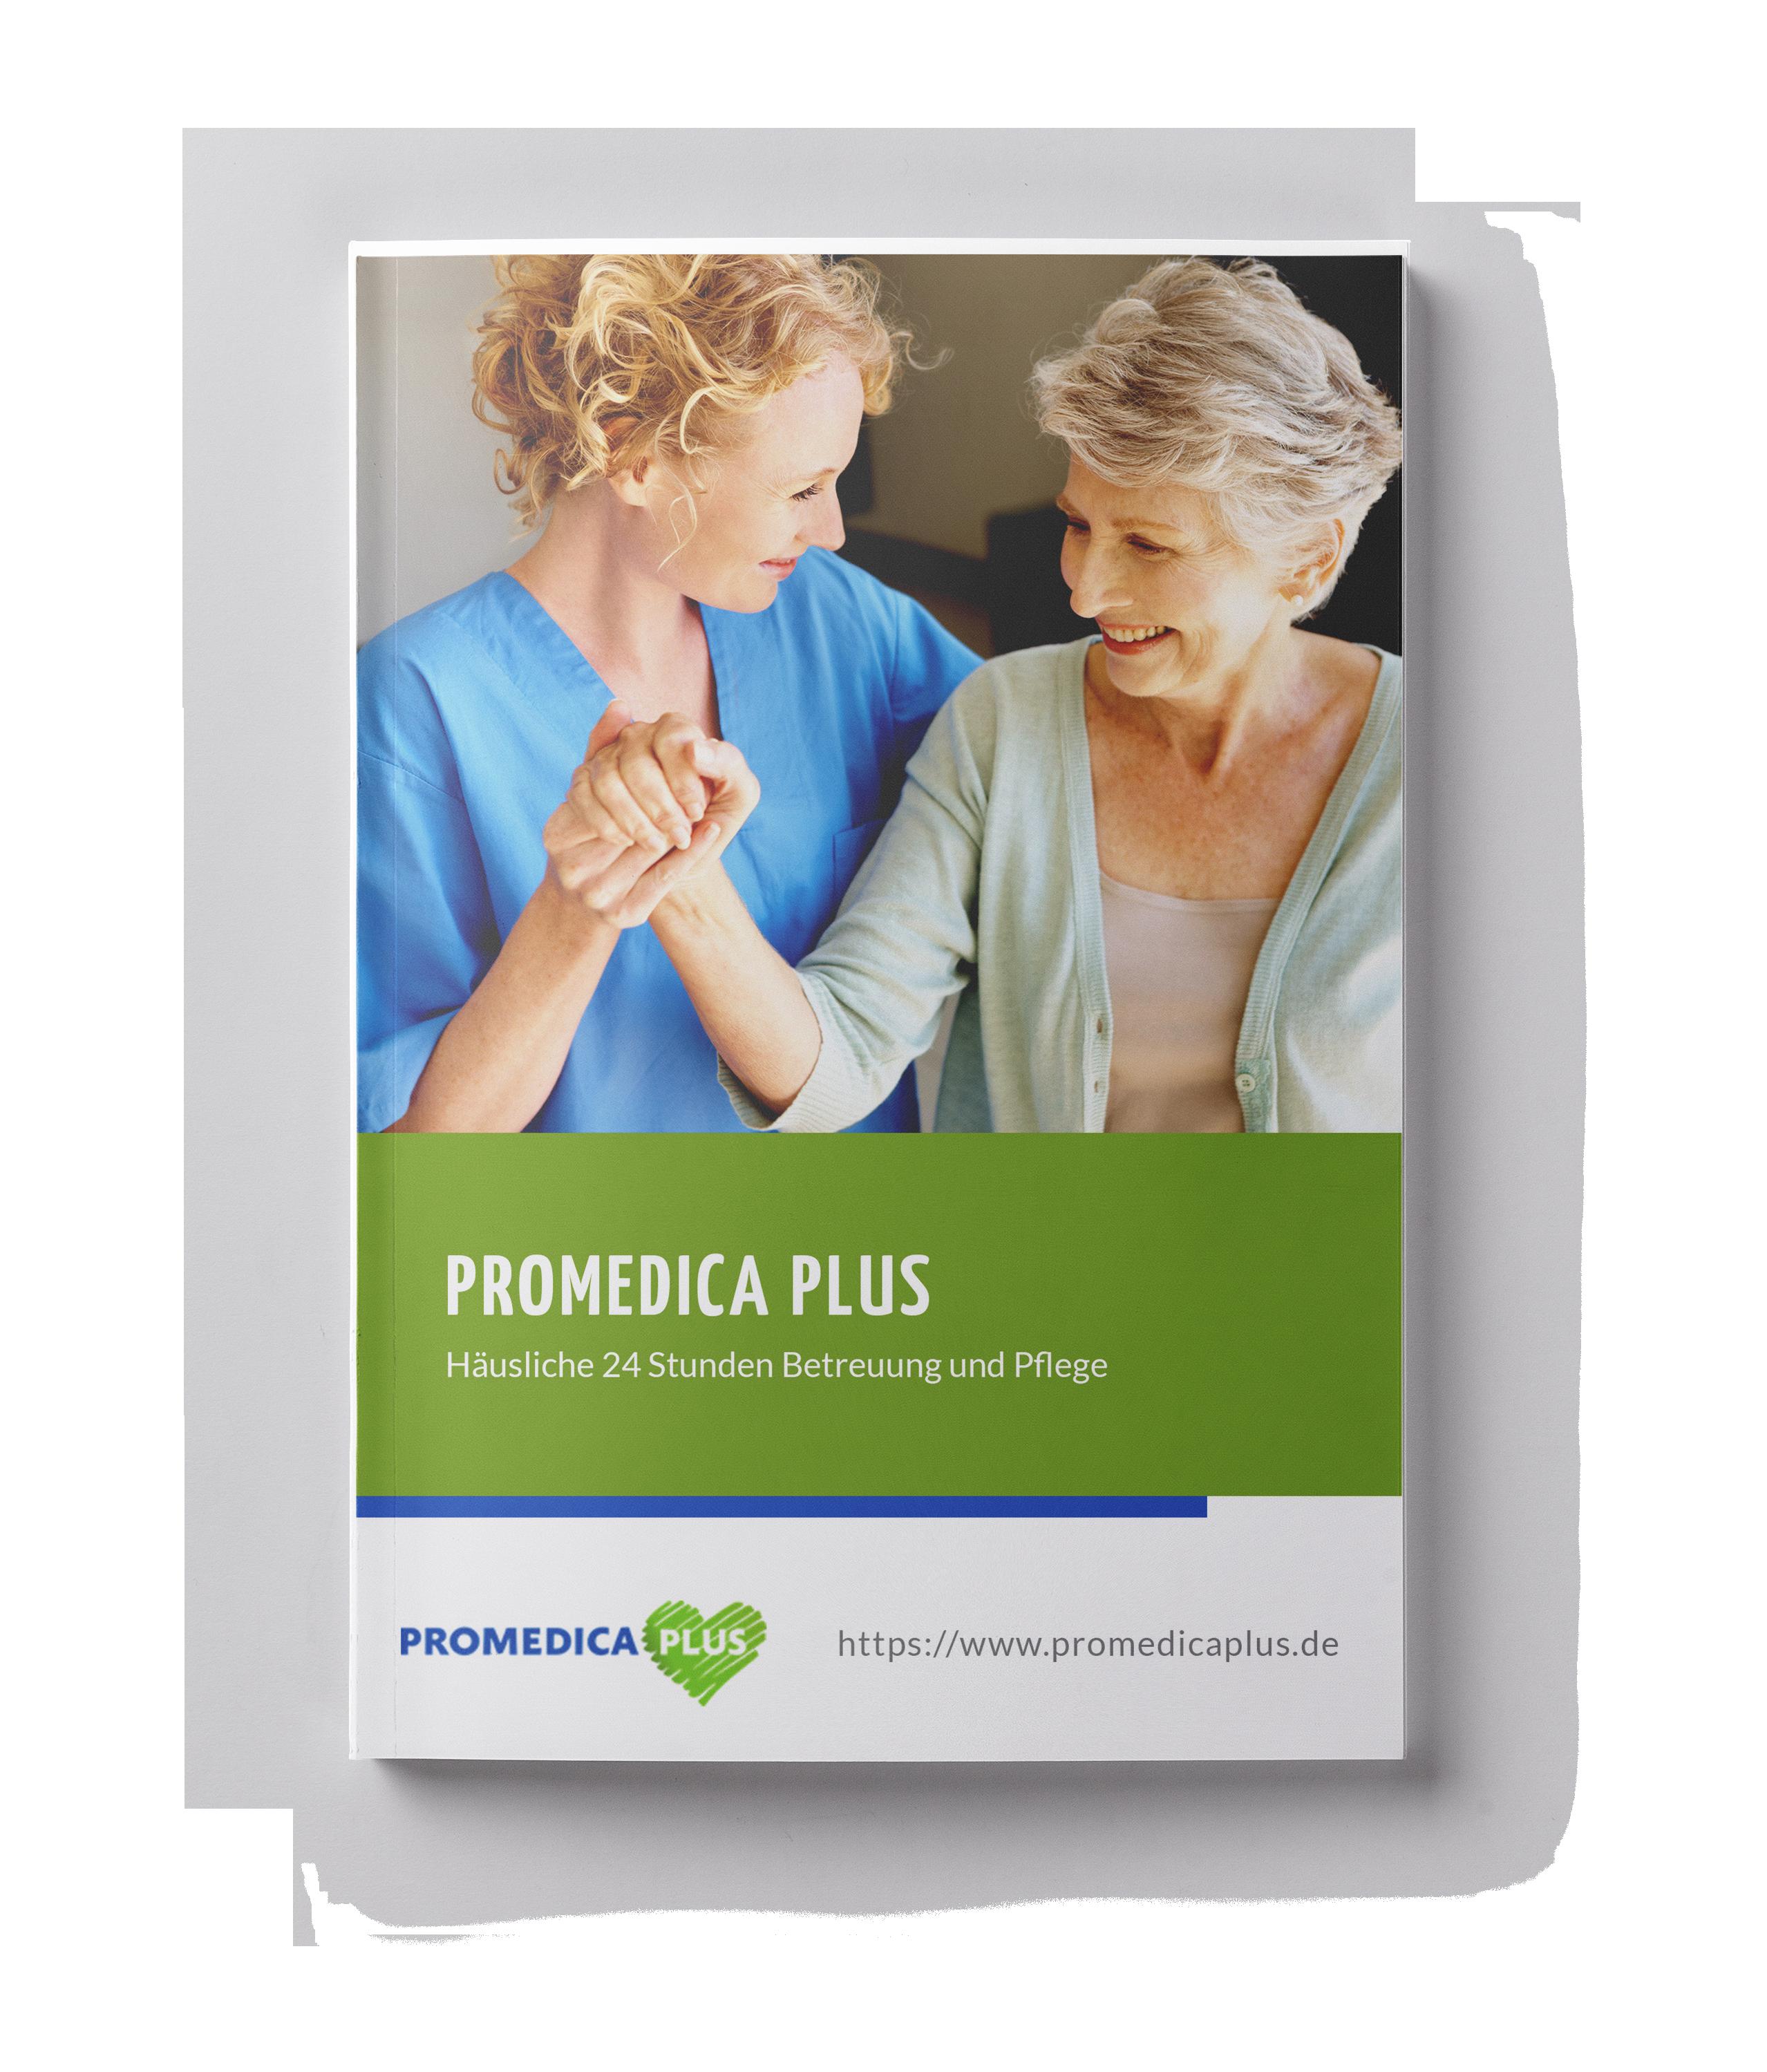 Case Study Promedica Plus Website Relaunch